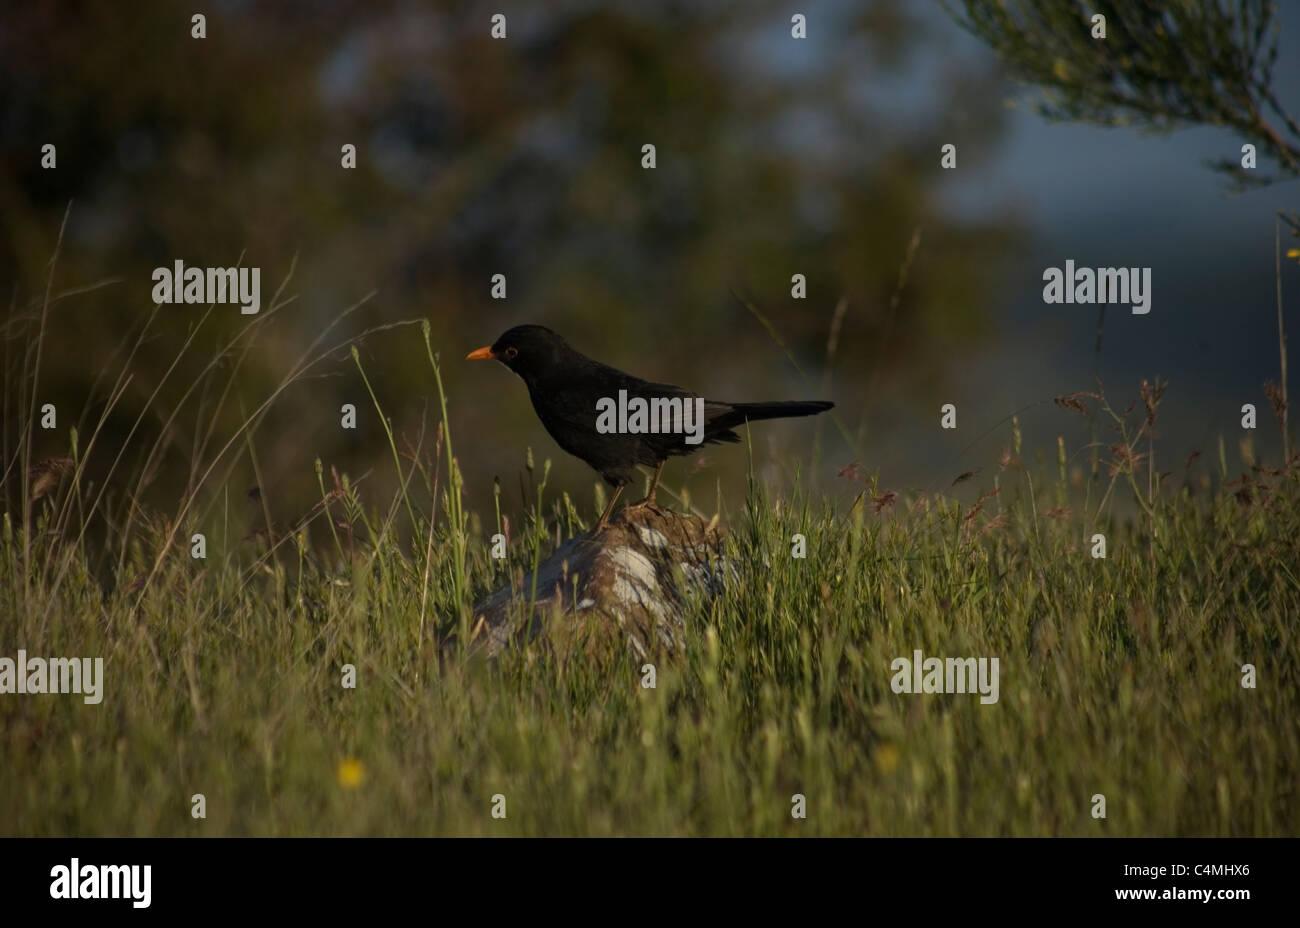 A common blackbird perches in a stone in the French Way of St. James Way, El Bierzo region, Castilla y Leon, Spain. - Stock Image